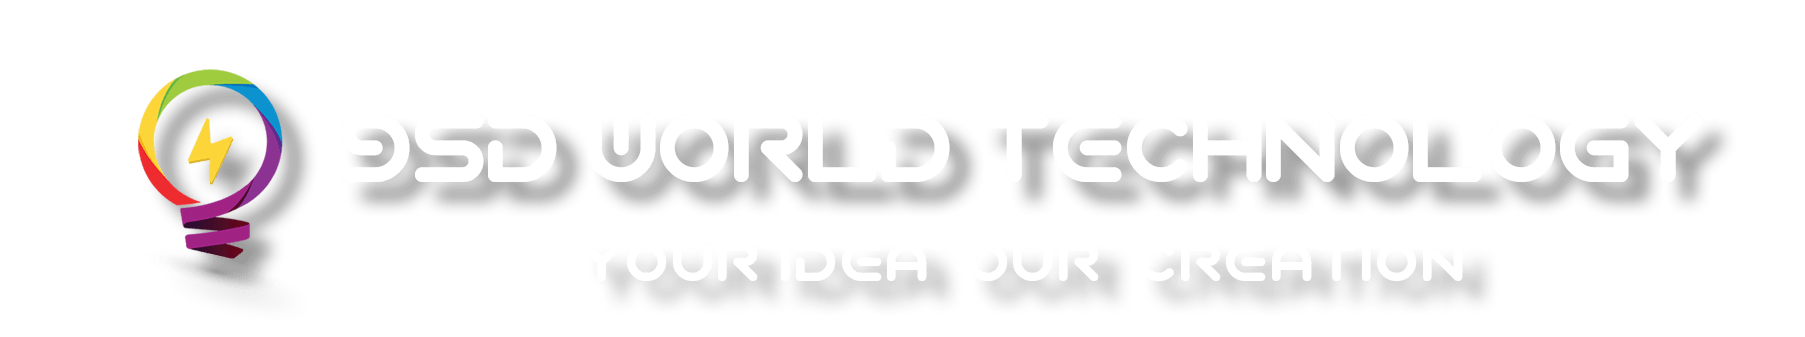 9sdworld